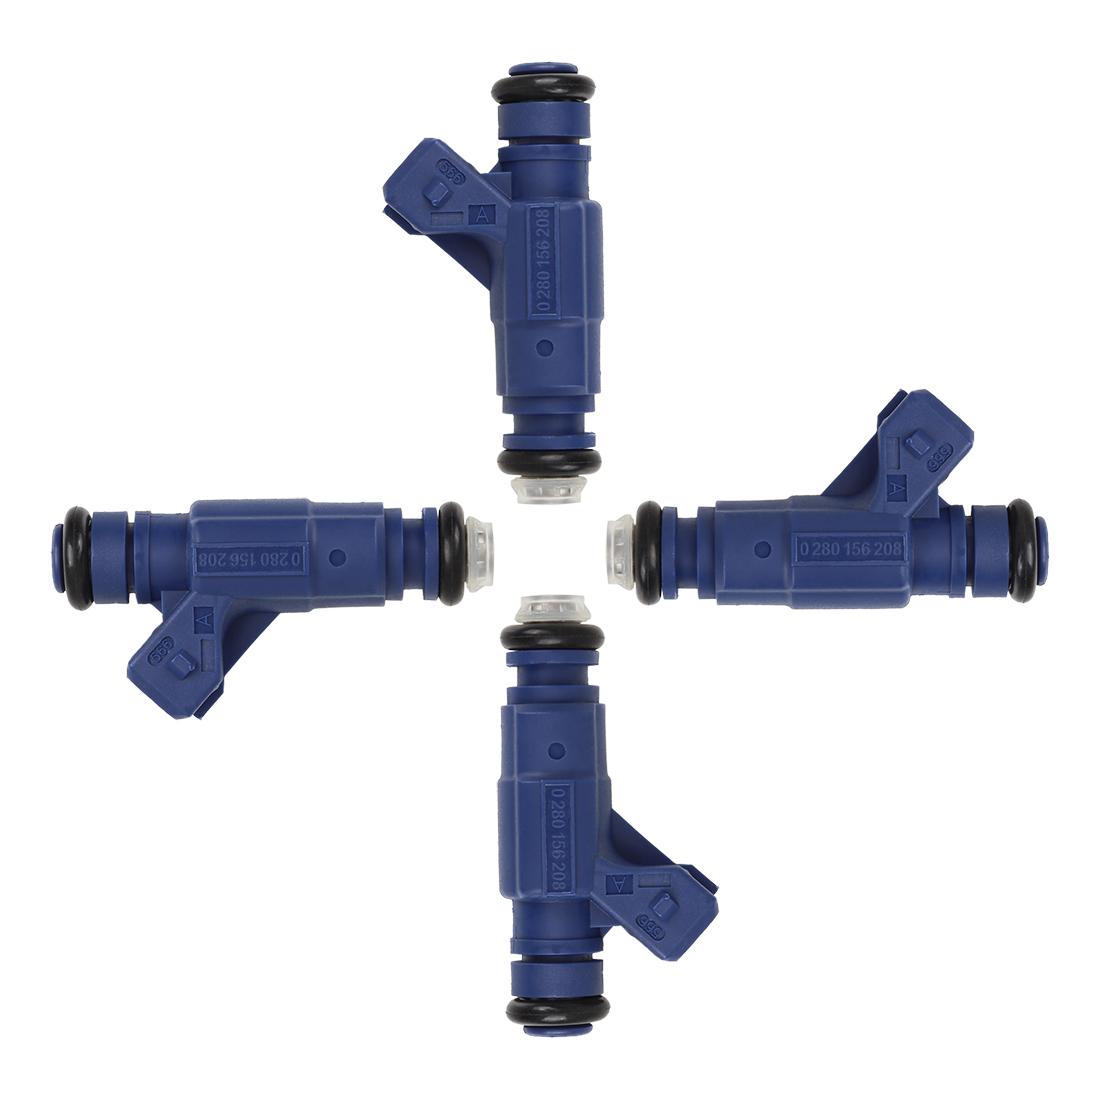 4pcs Fuel Injector 0280156208 for Polaris Sportsman EFI 700 800 RZR Ranger